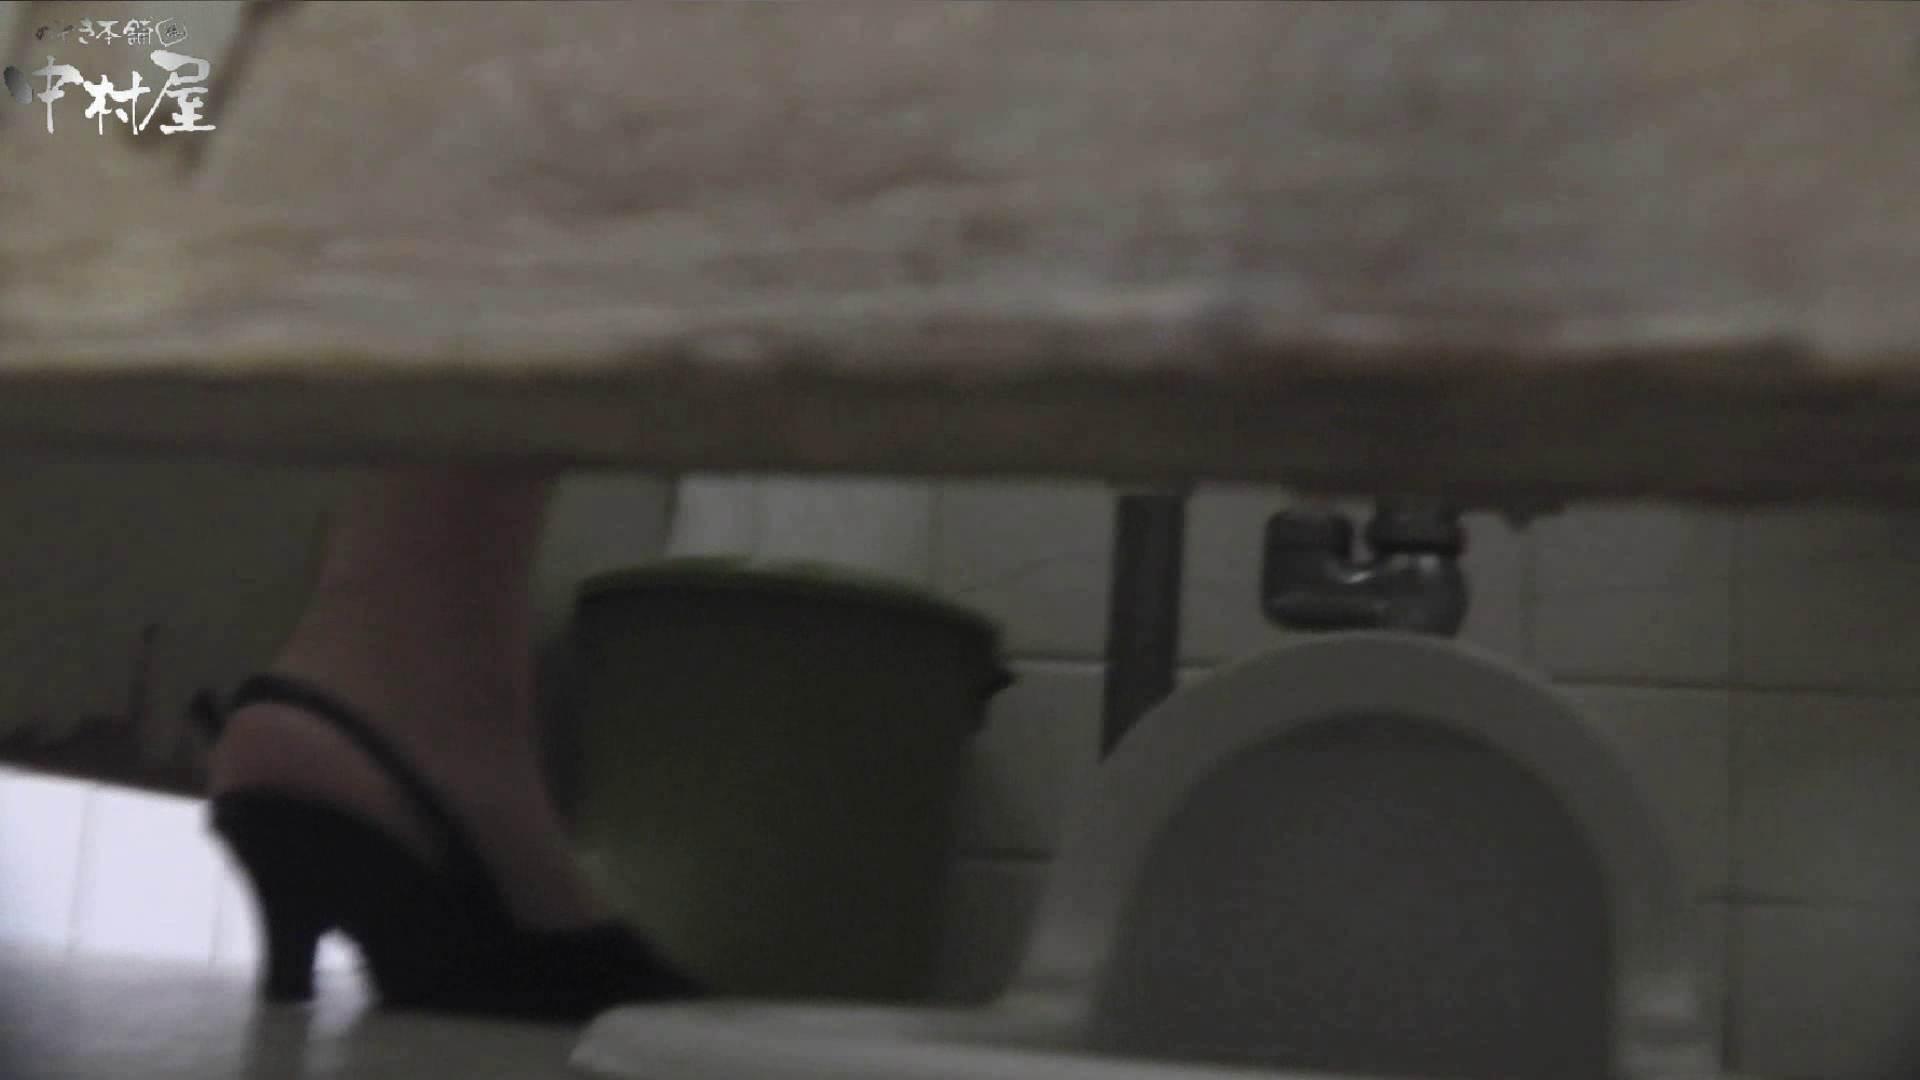 vol.41 命がけ潜伏洗面所! 毛薄め・硬度並・推定250g 美しいOLの裸体 濡れ場動画紹介 93pic 14